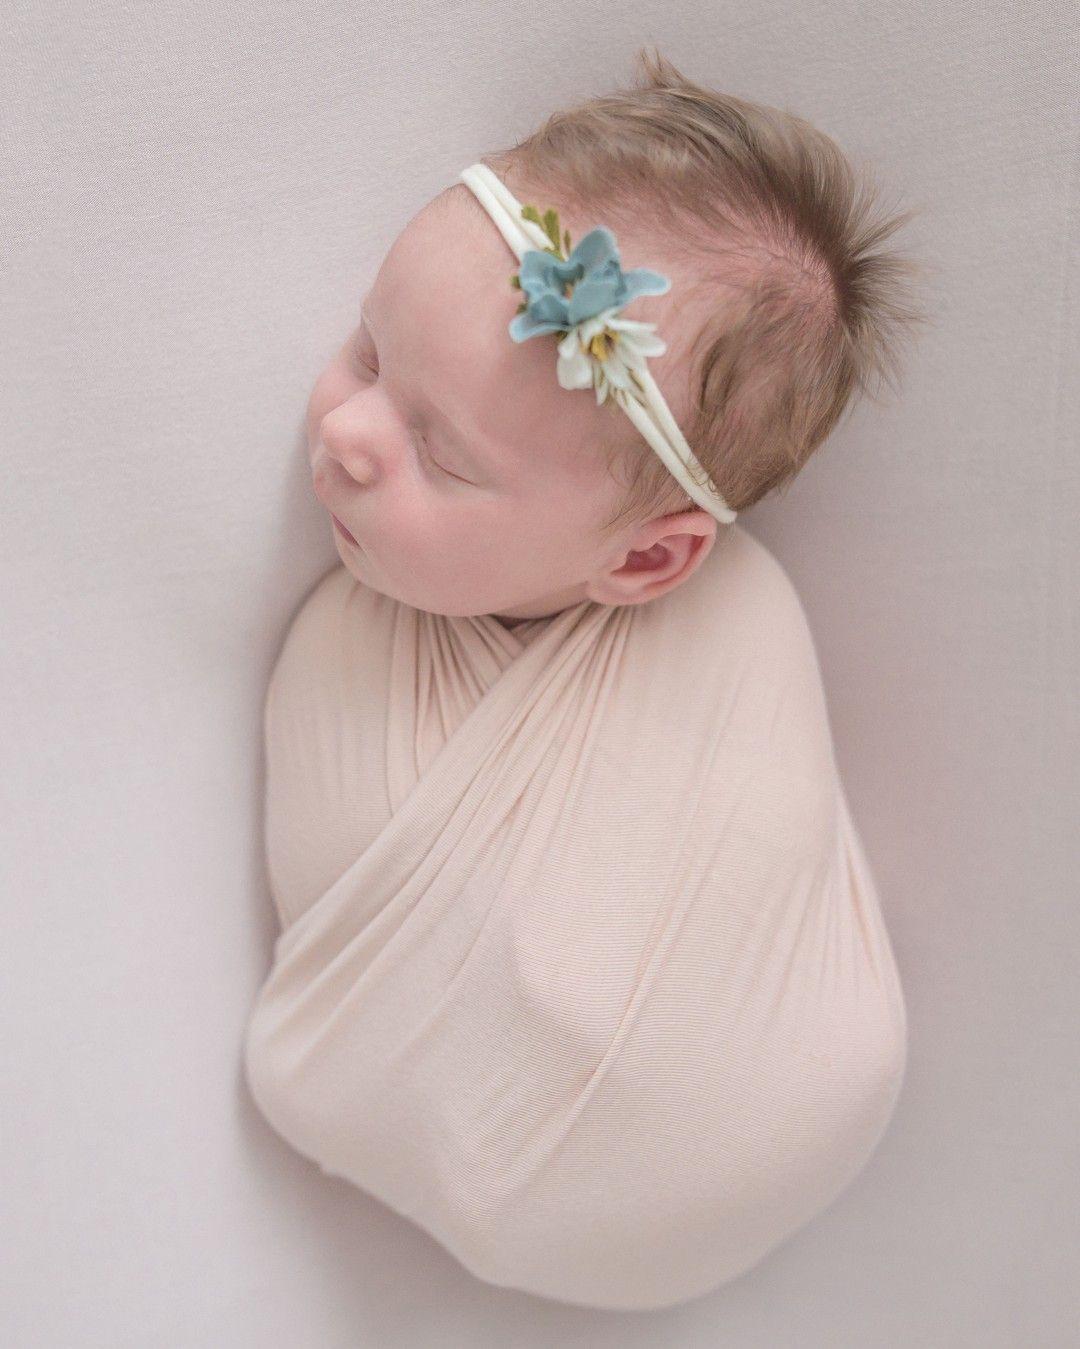 Baby Sleeping Up On Knees : sleeping, knees, Elusivephoto, Posted, Instagram:, Sweet, Little, Natalee, Loved, Being, Wrapped, Knees, Remem…, Newborn,, Newborn, Photographer